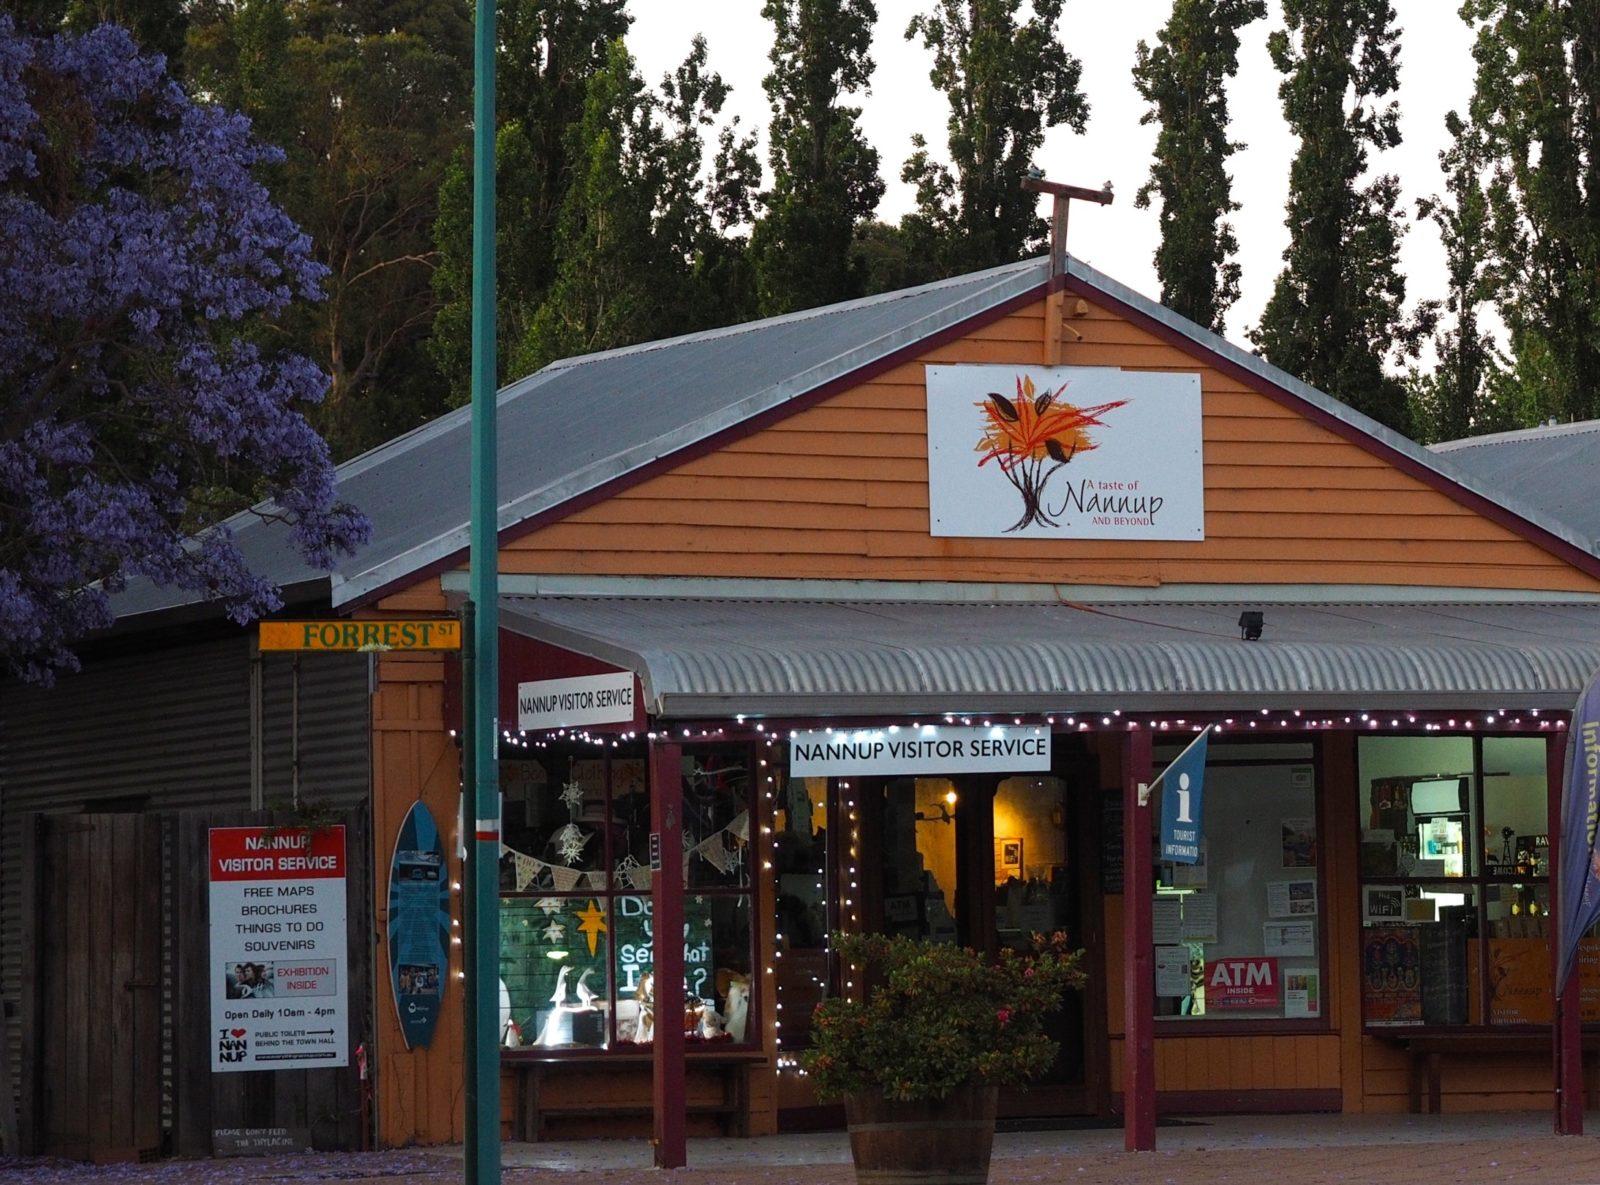 Nannup Visitors Centre, Nannup, Western Australia